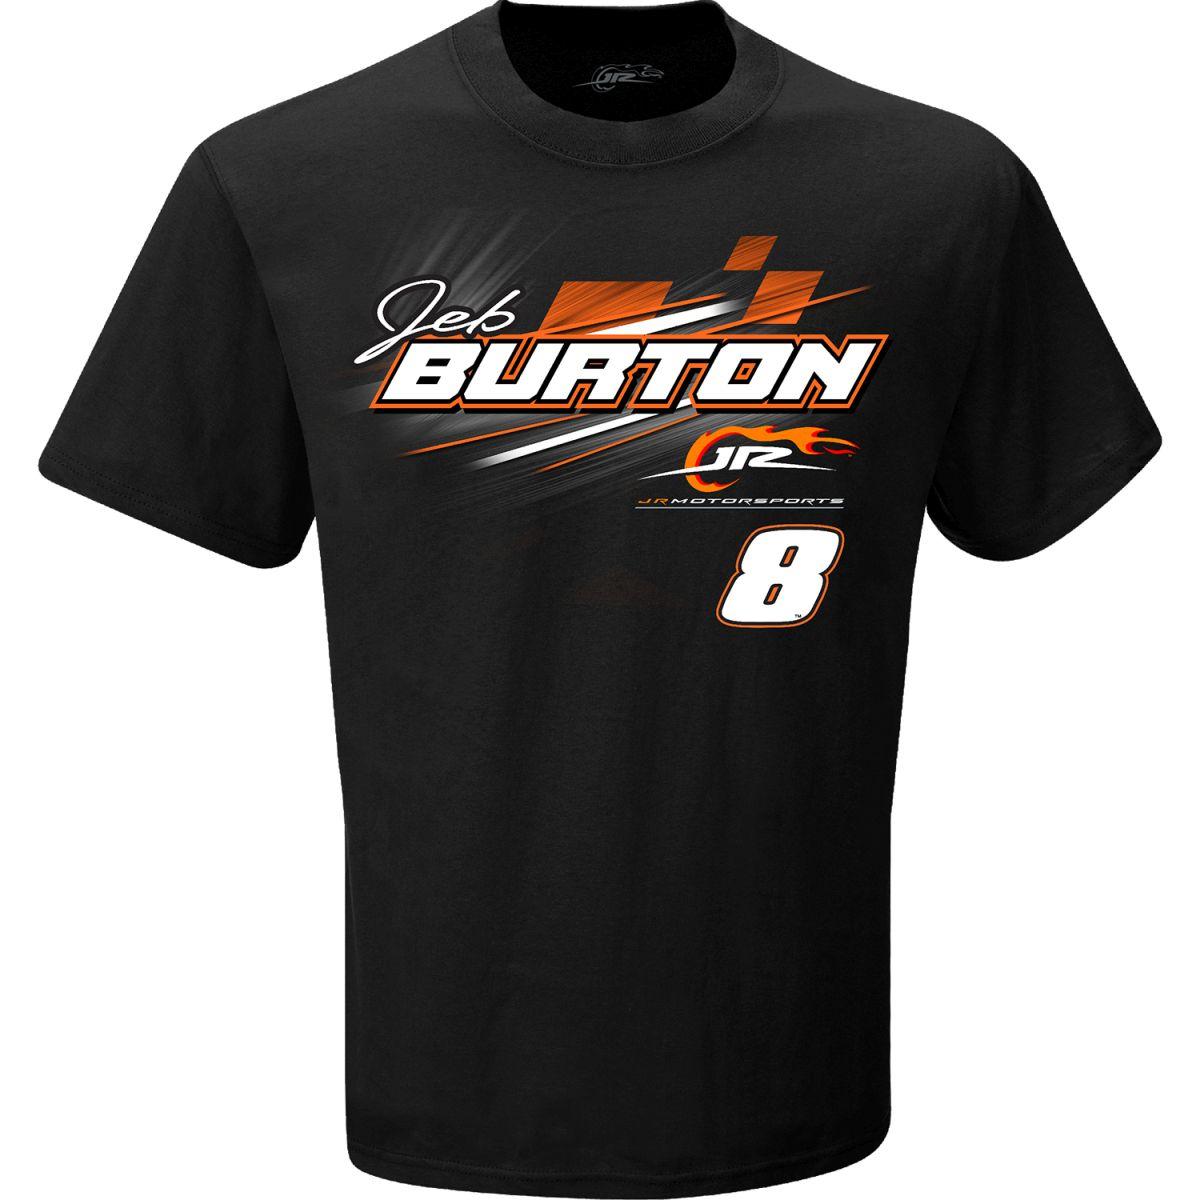 Jeb Burton #8 State Water Heaters Black T-shirt